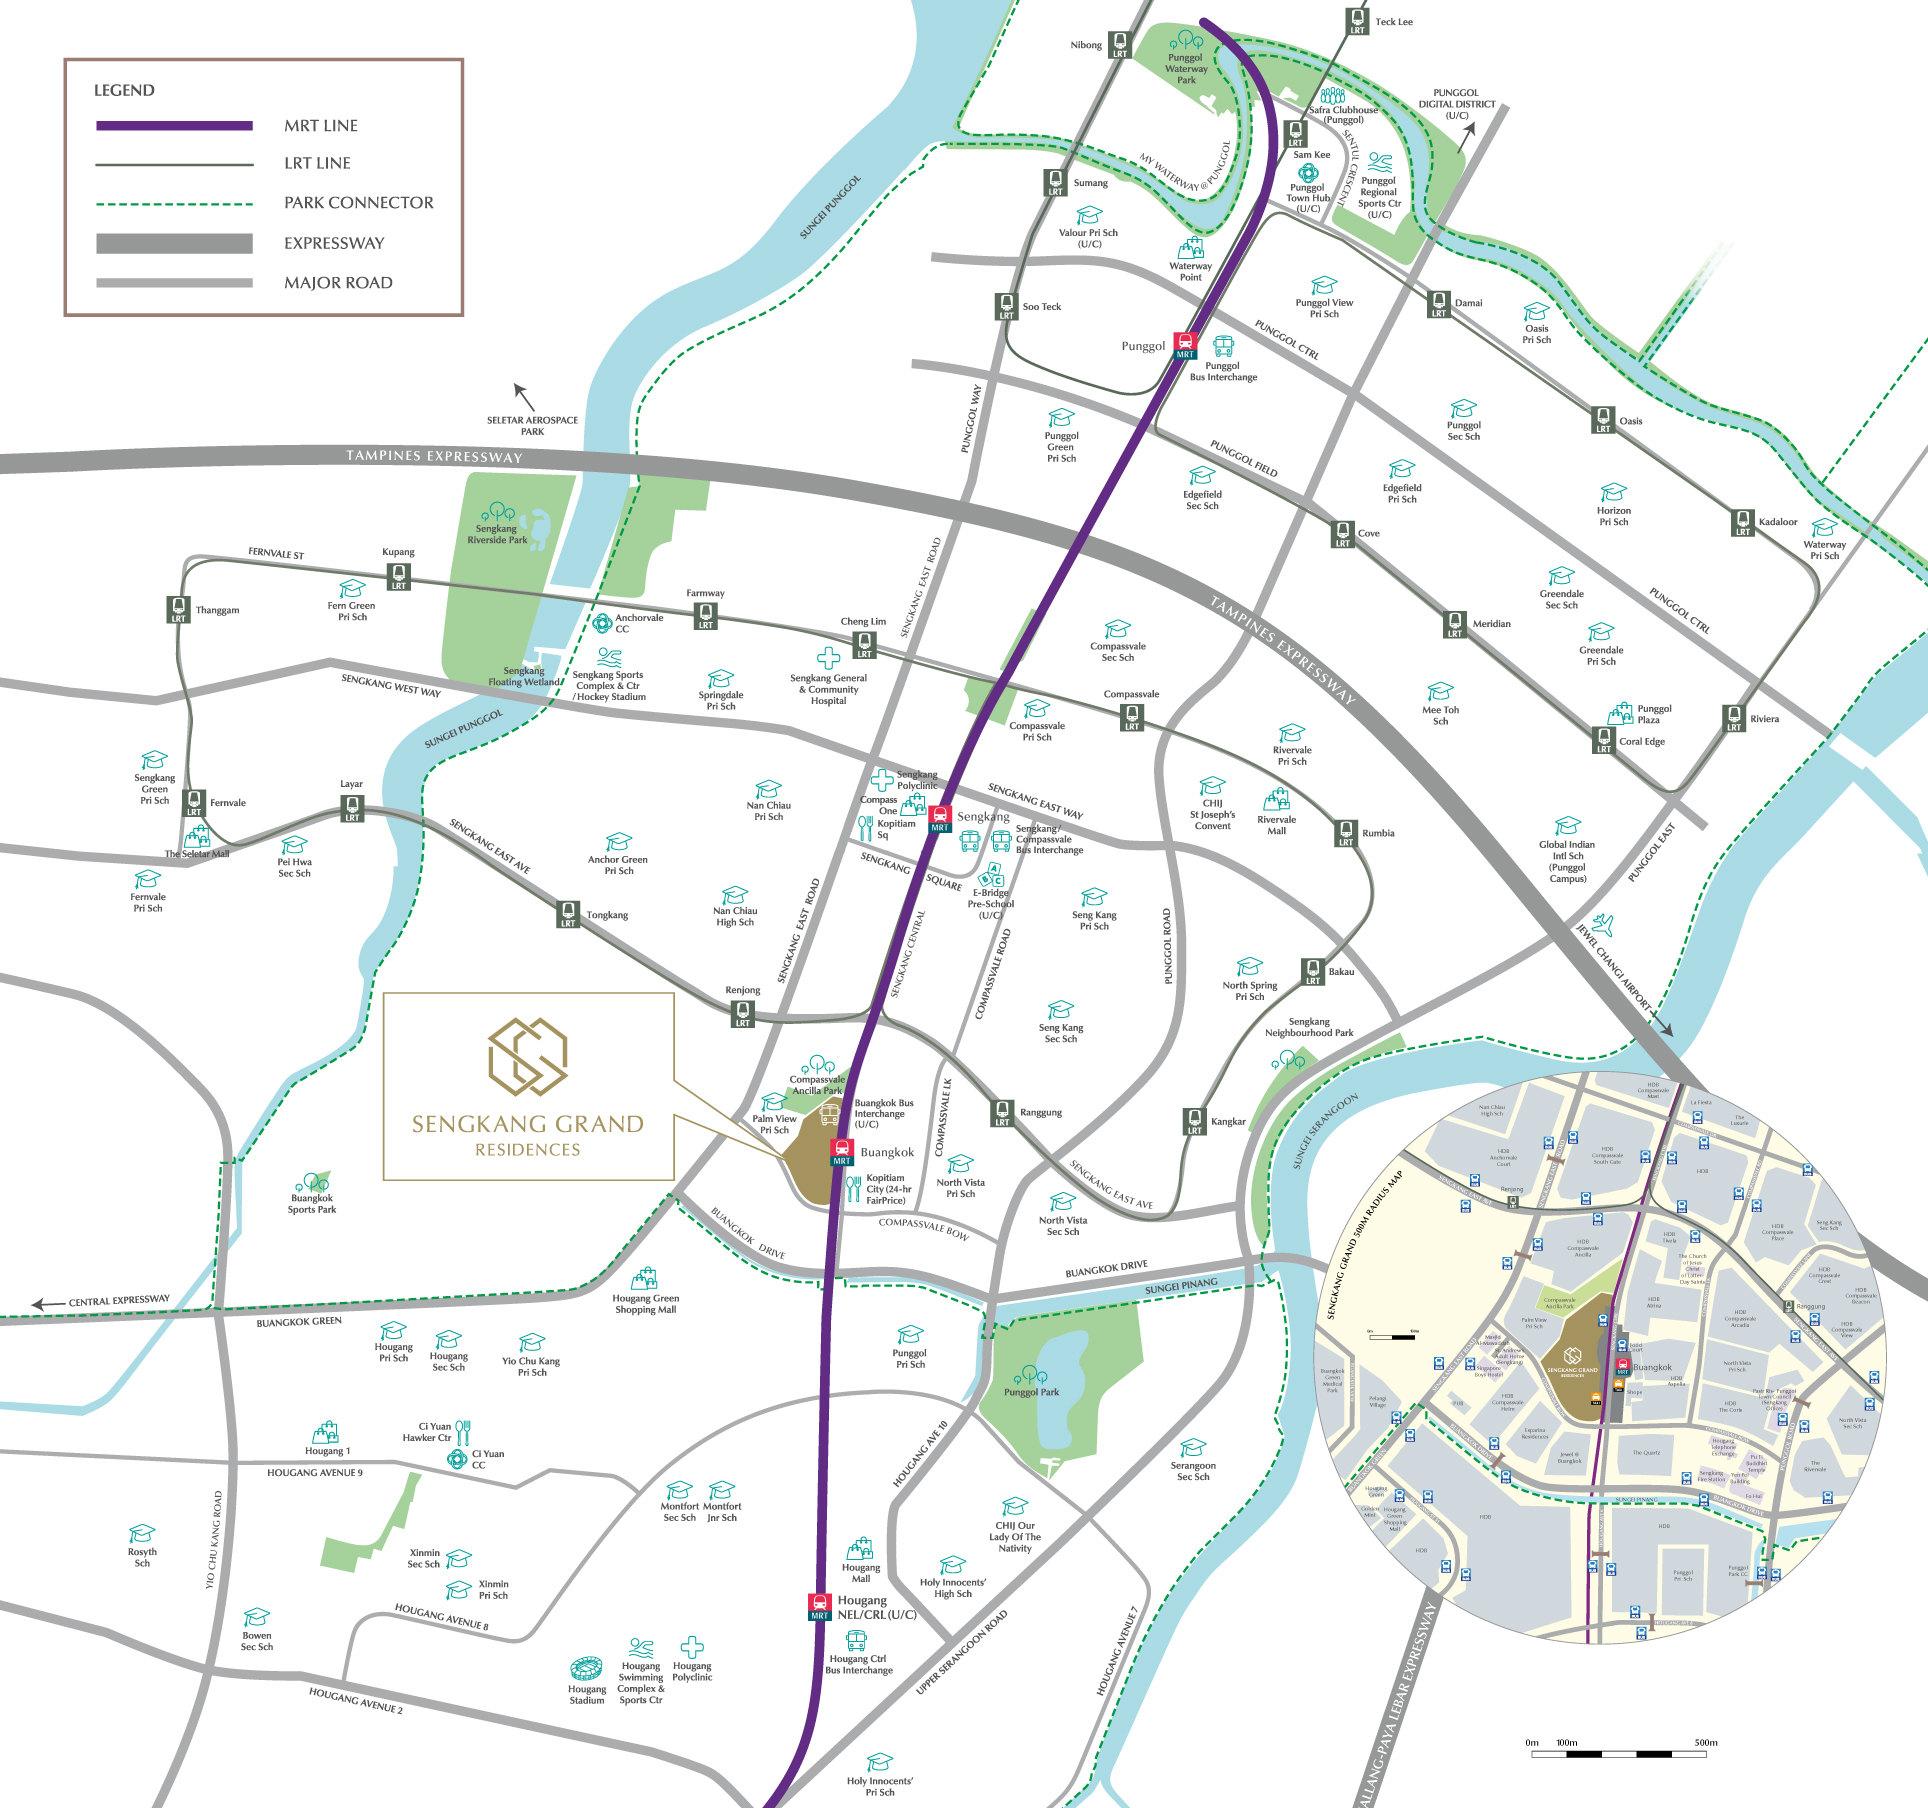 Sengkang Grand Residences Location Map